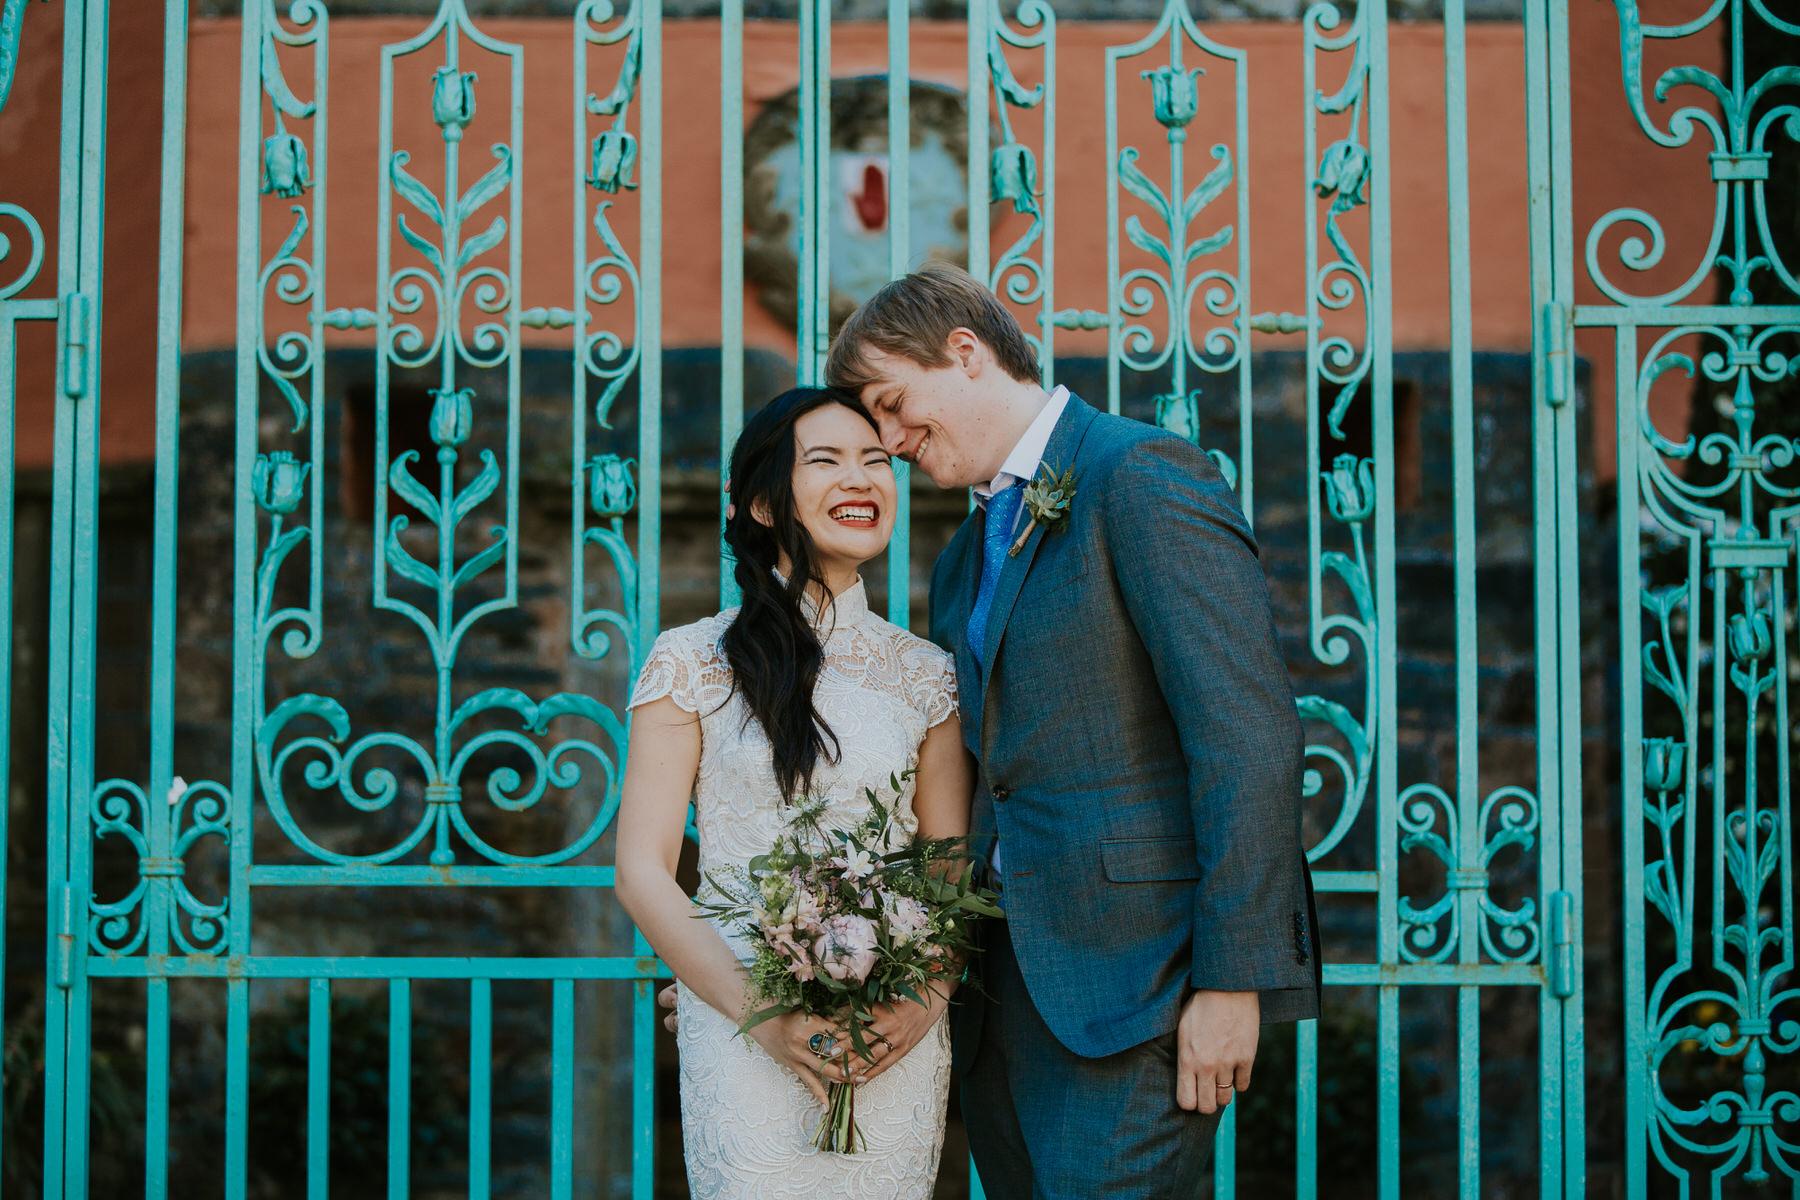 1000 Shaina & Gwilym Wedding portrait turquoise wrought iron gate Portmeirion.jpg